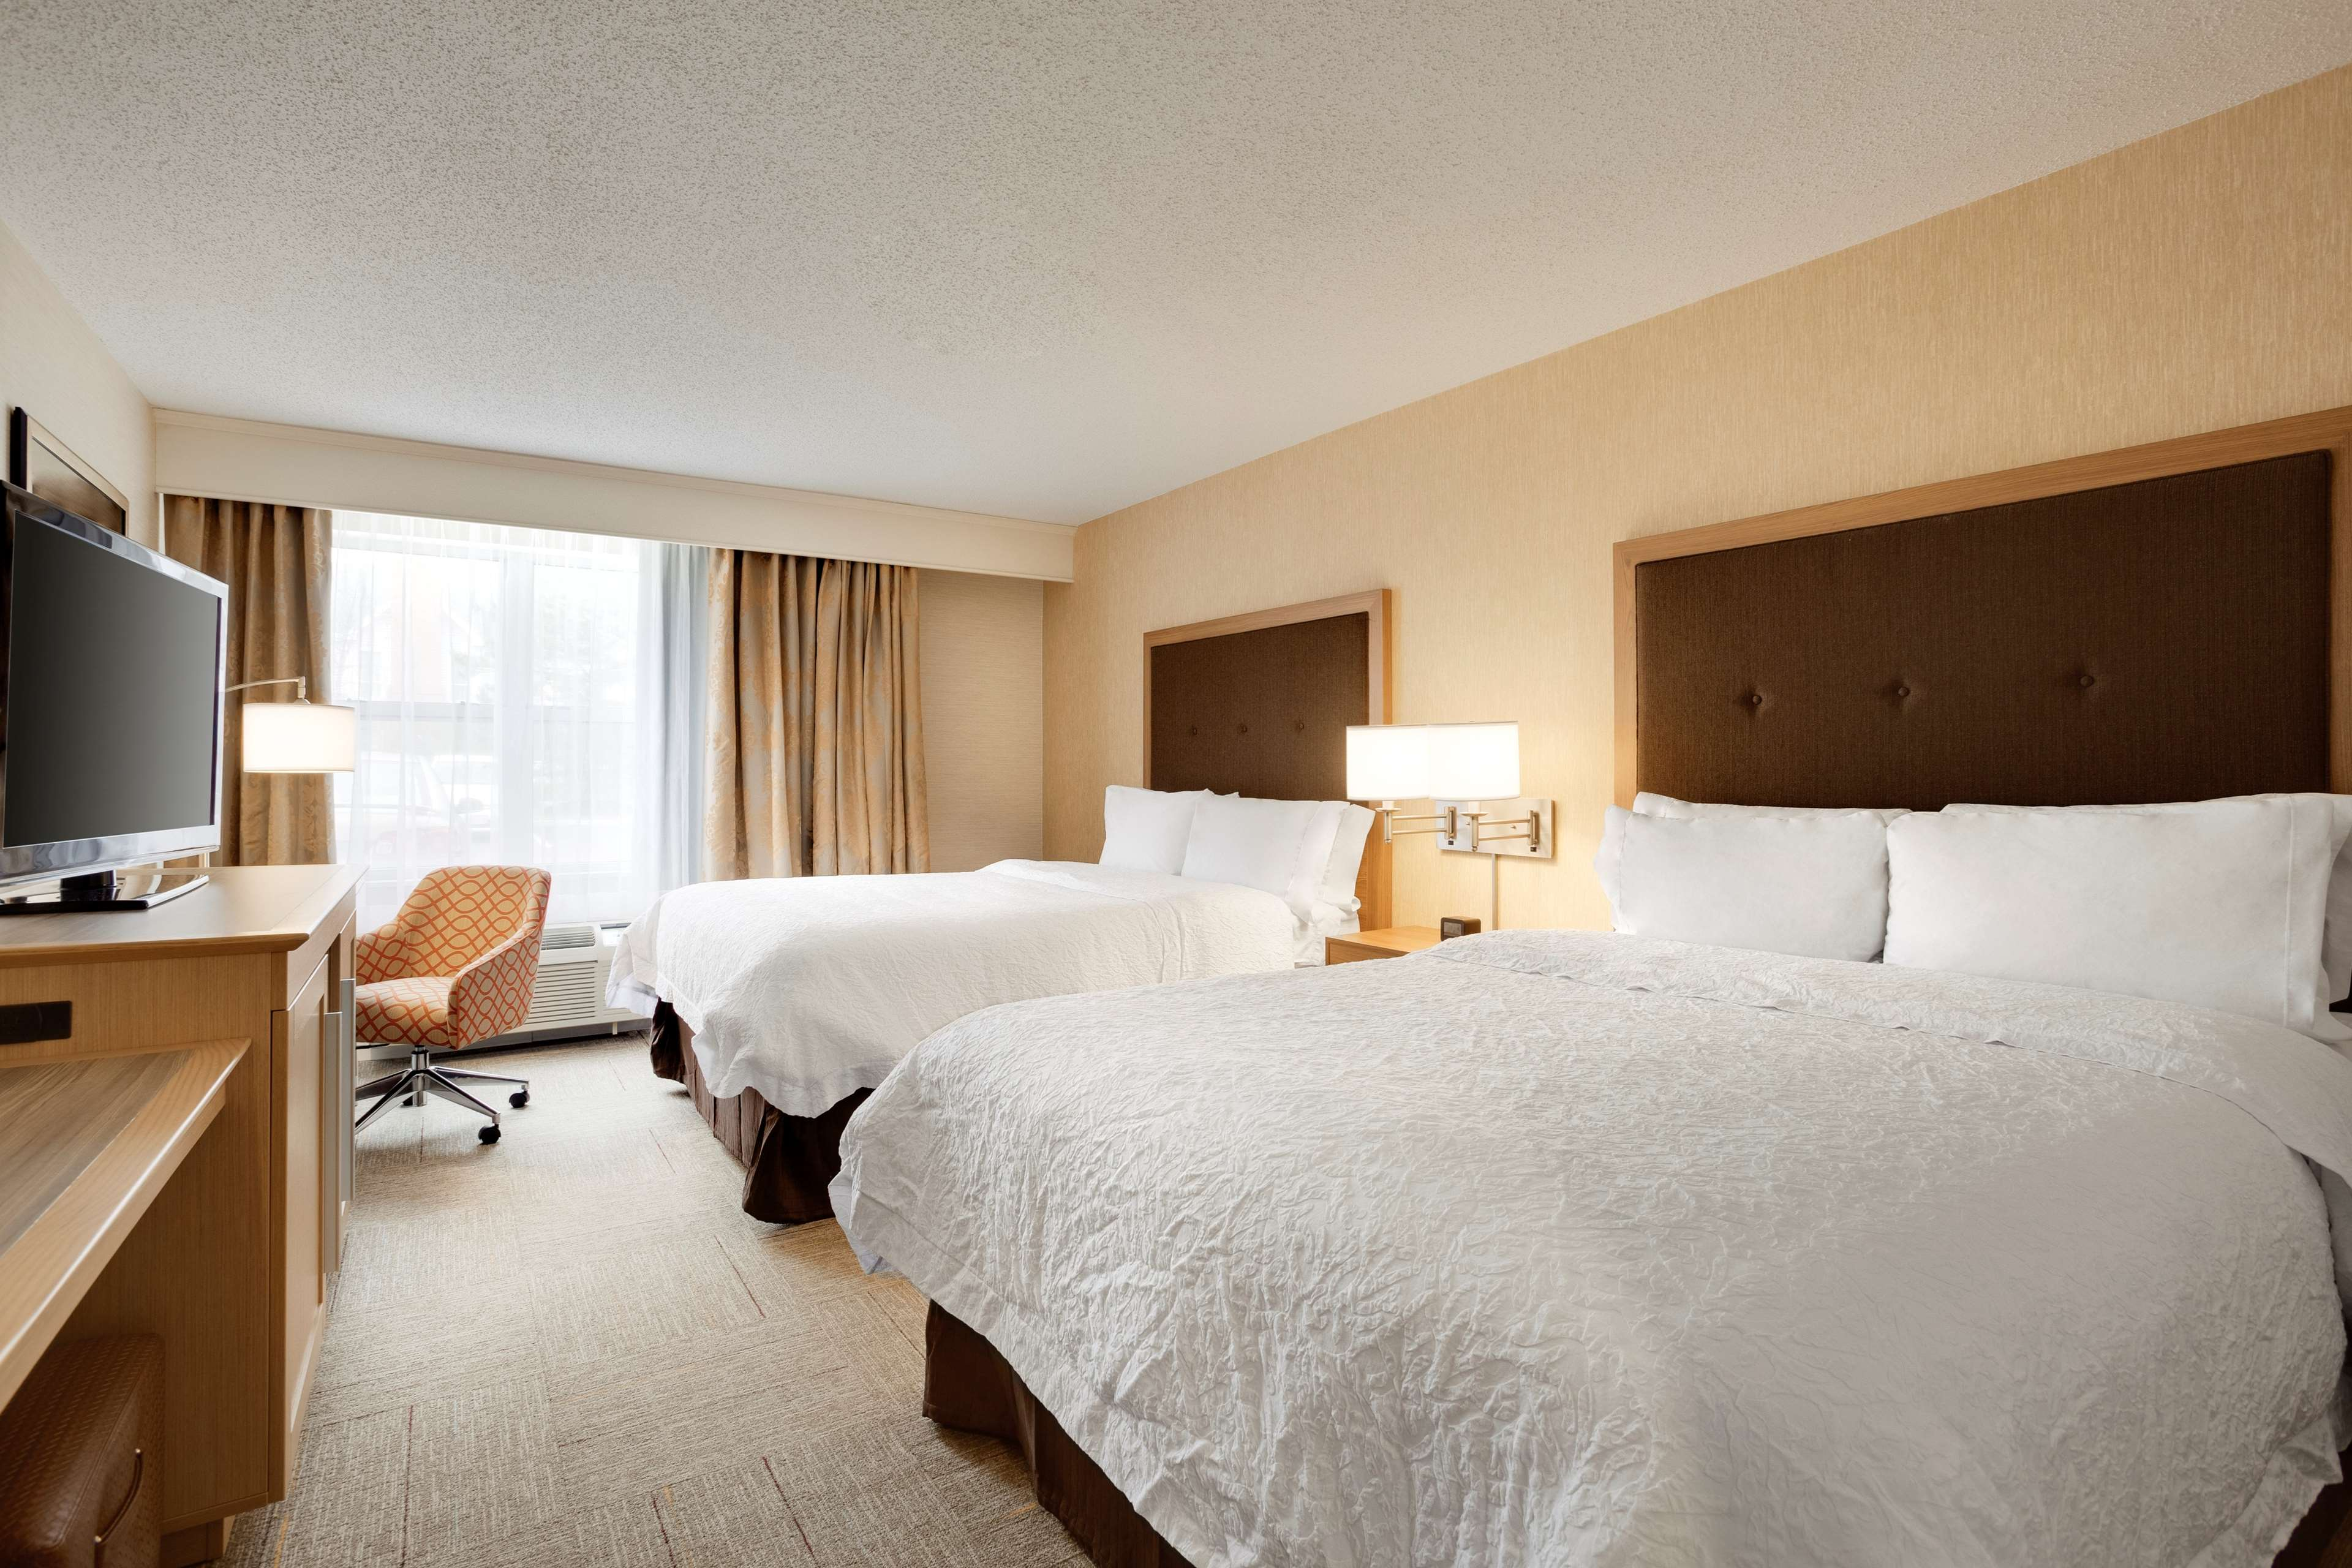 Hampton Inn & Suites Cleveland/Independence image 13